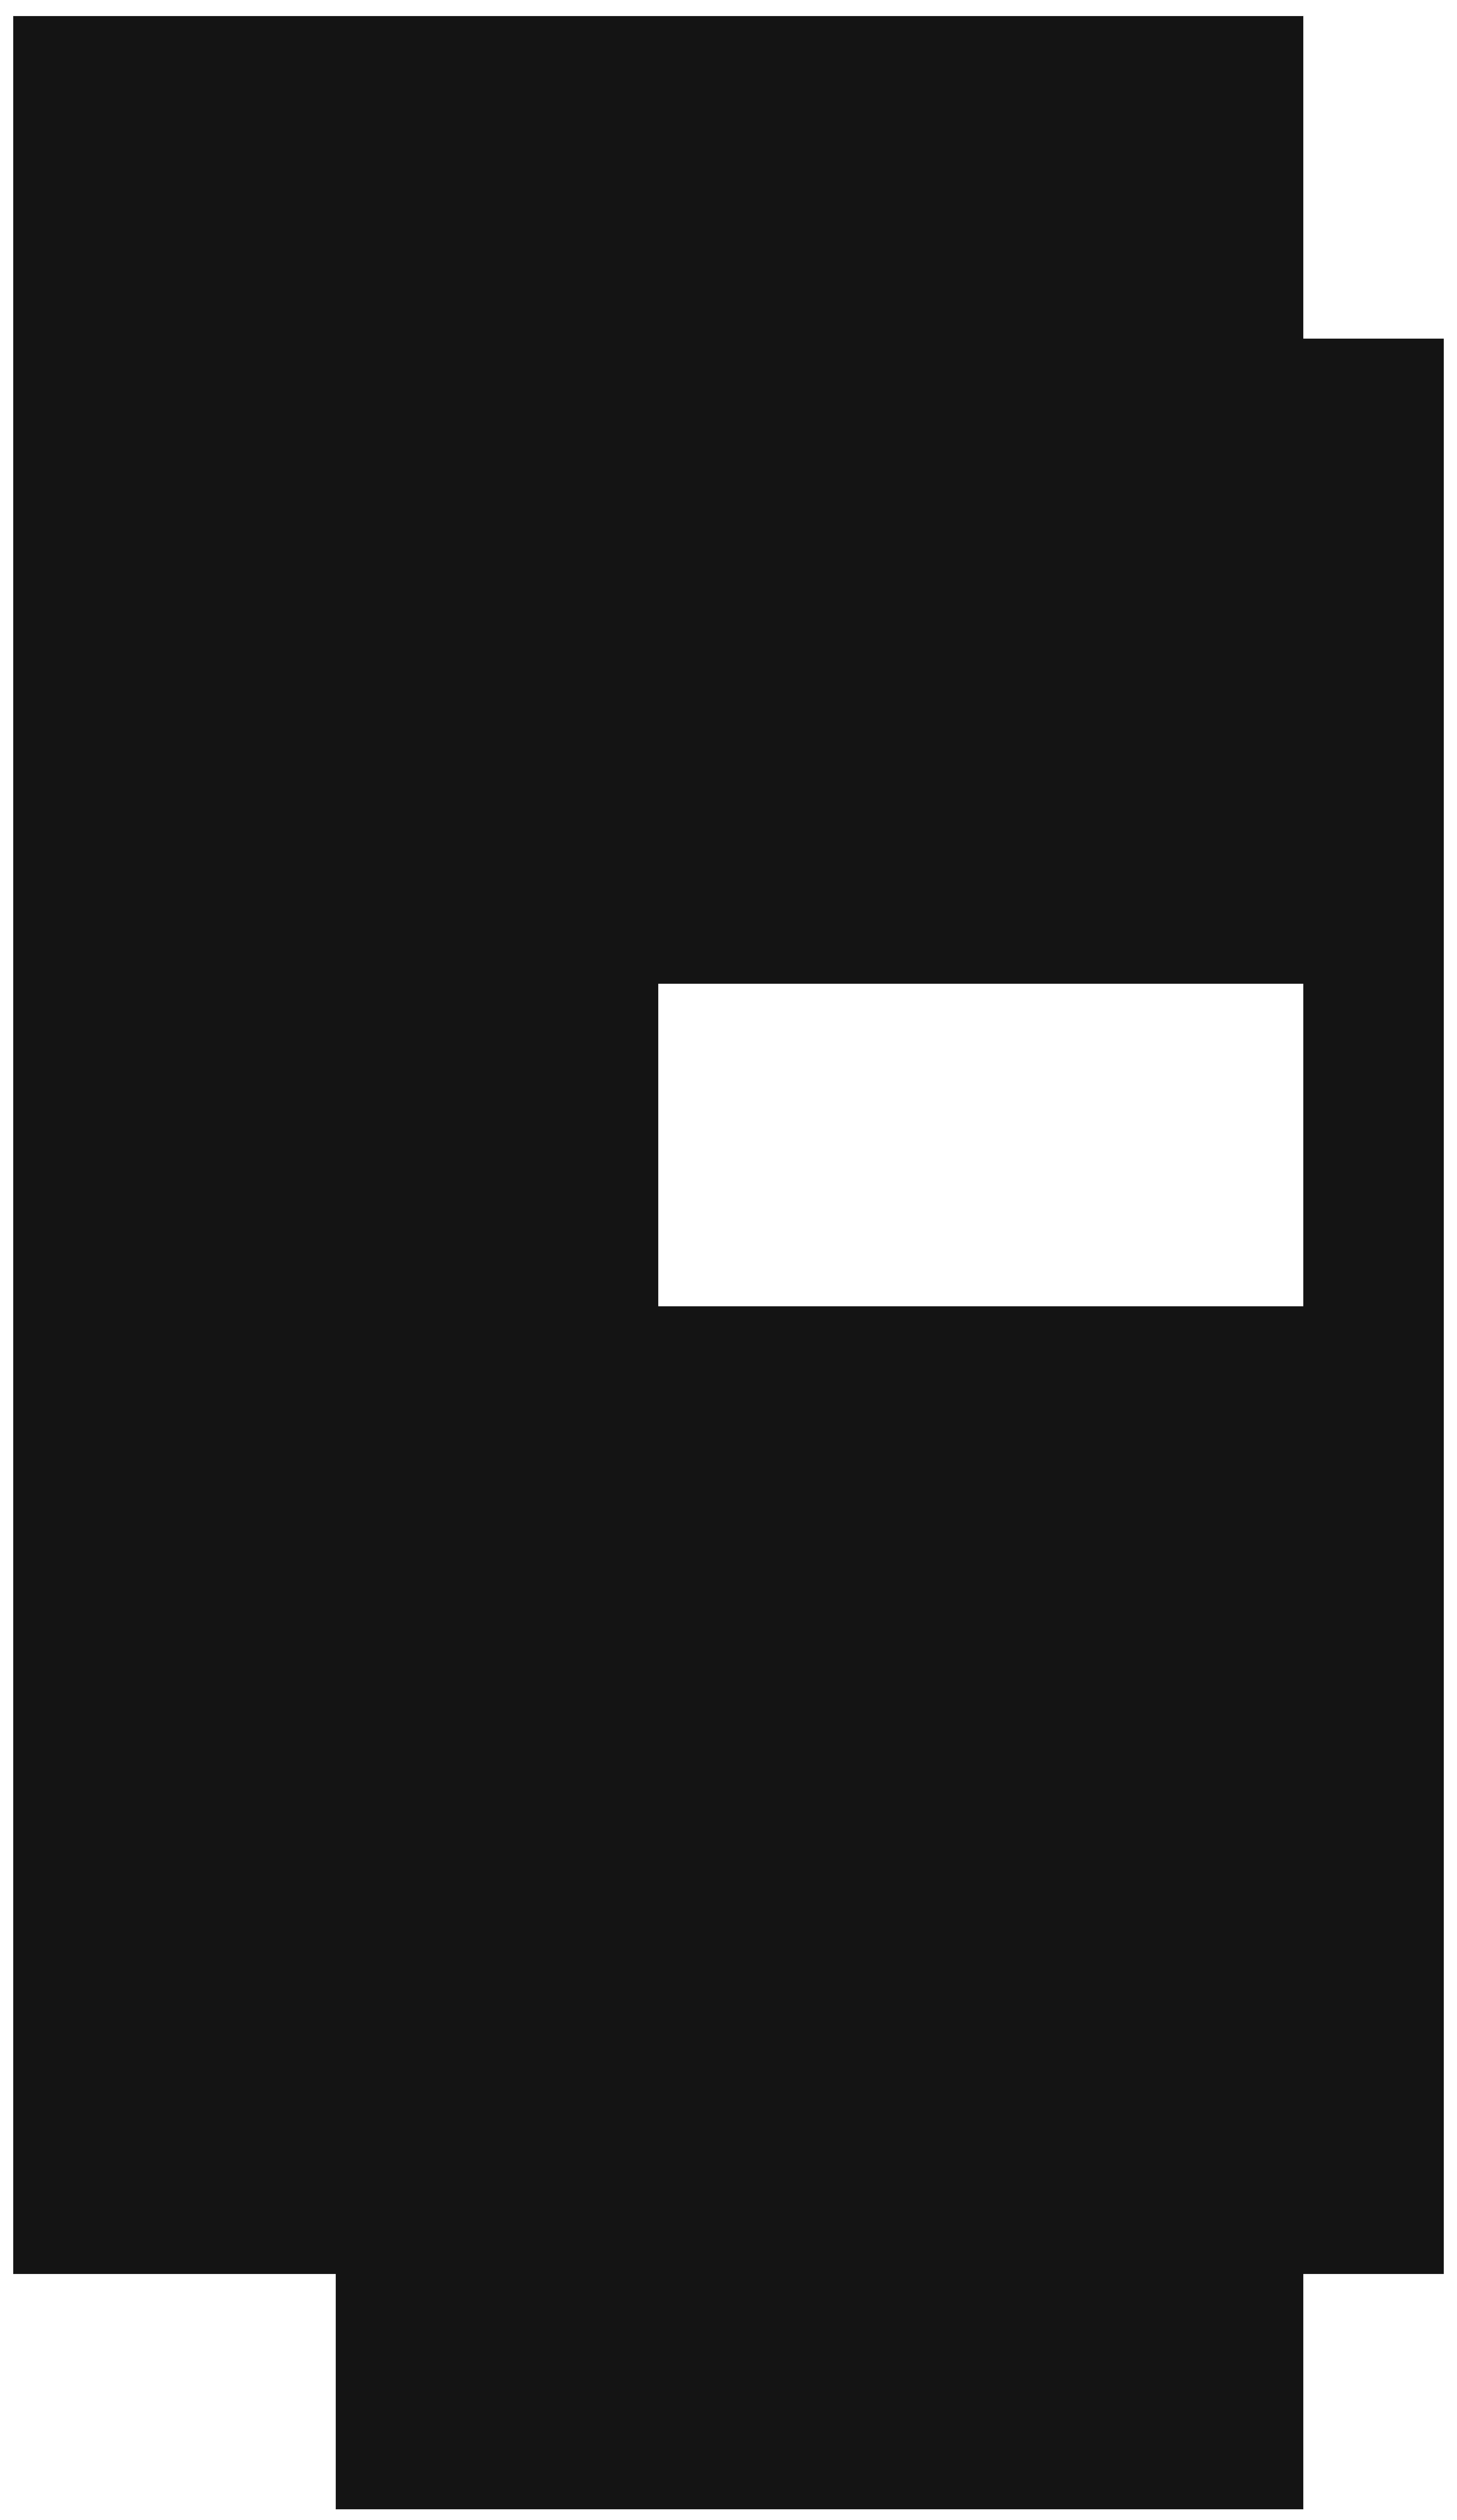 Hipster Hair Transparent Clip Art Image.